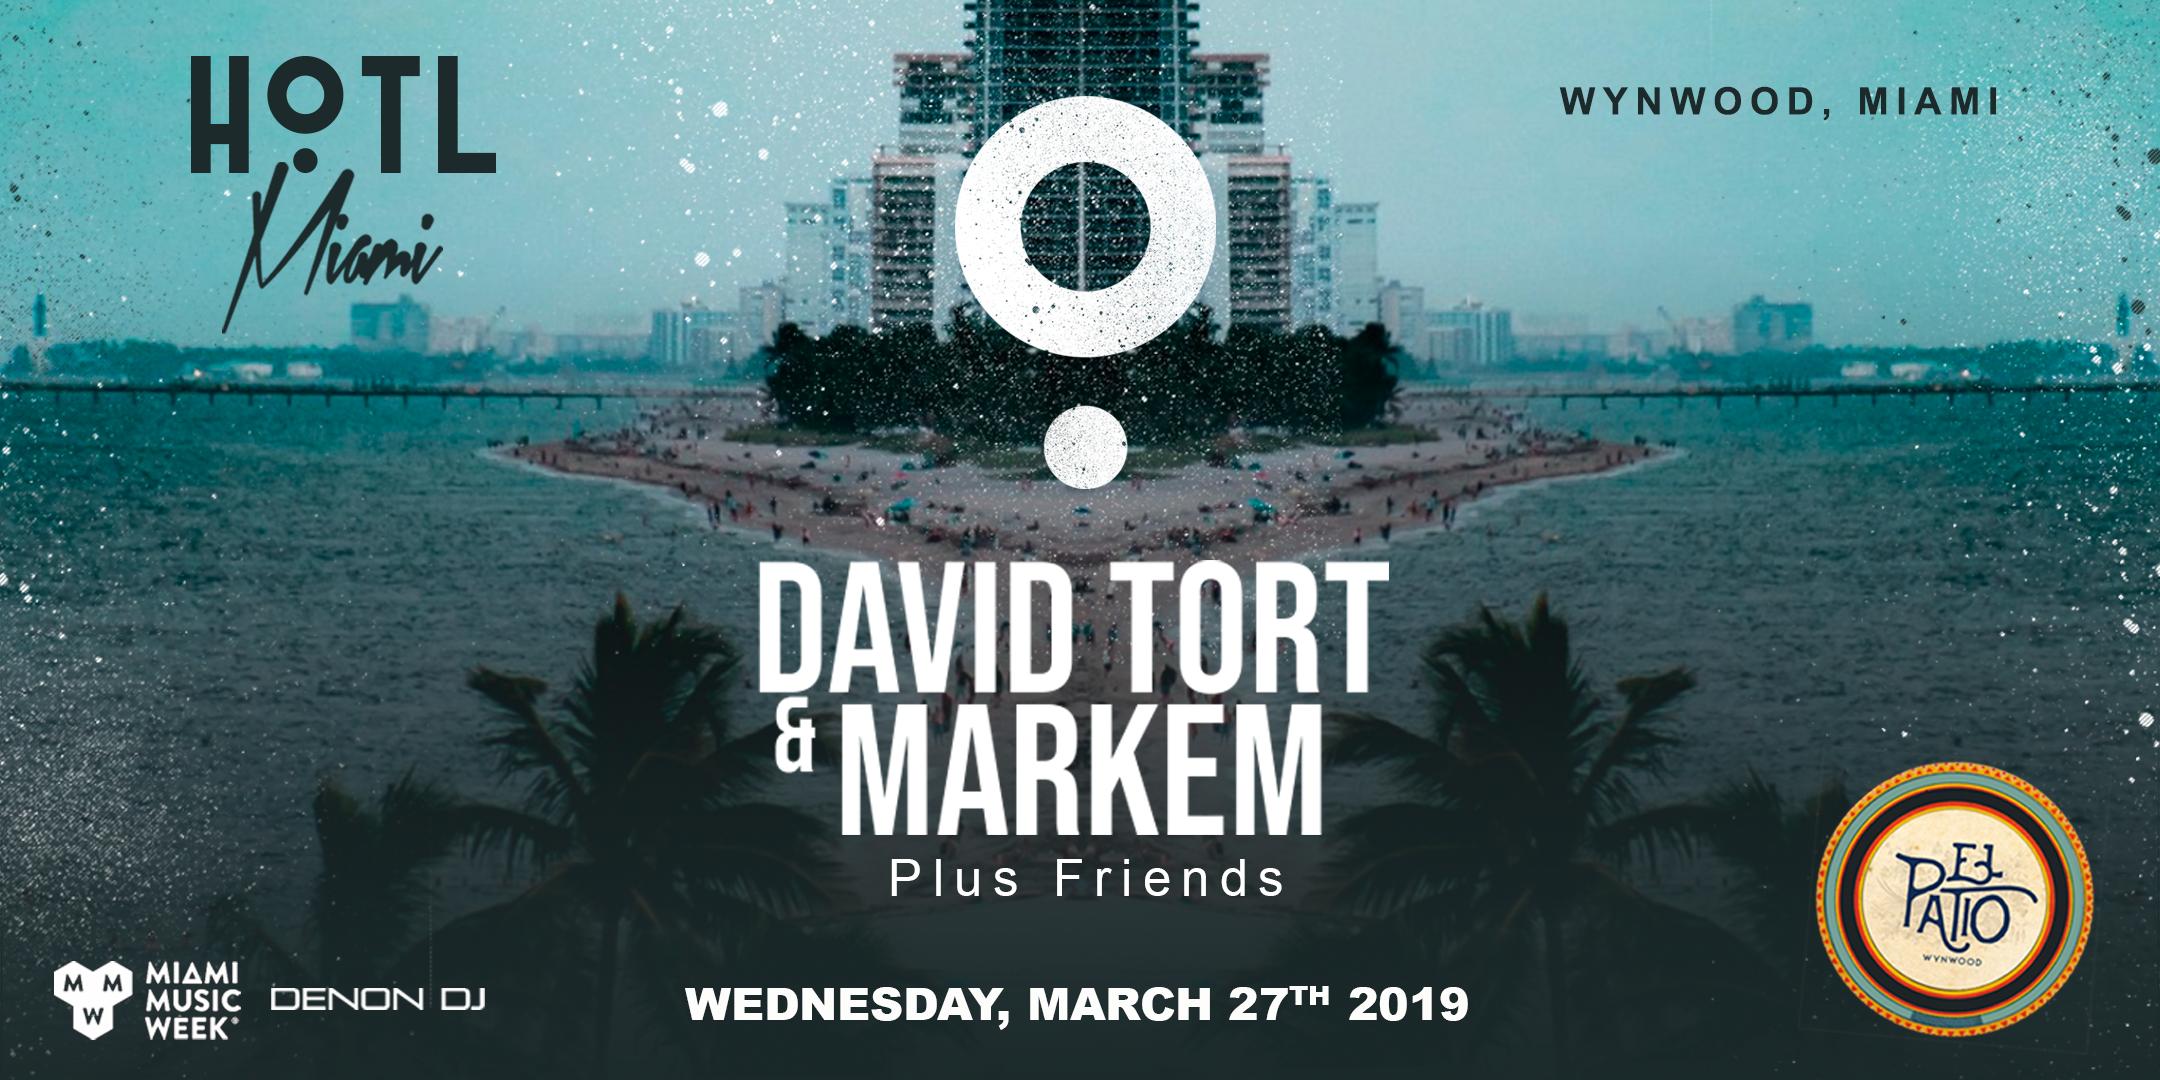 HoTL Miami 2019 Showcase Image